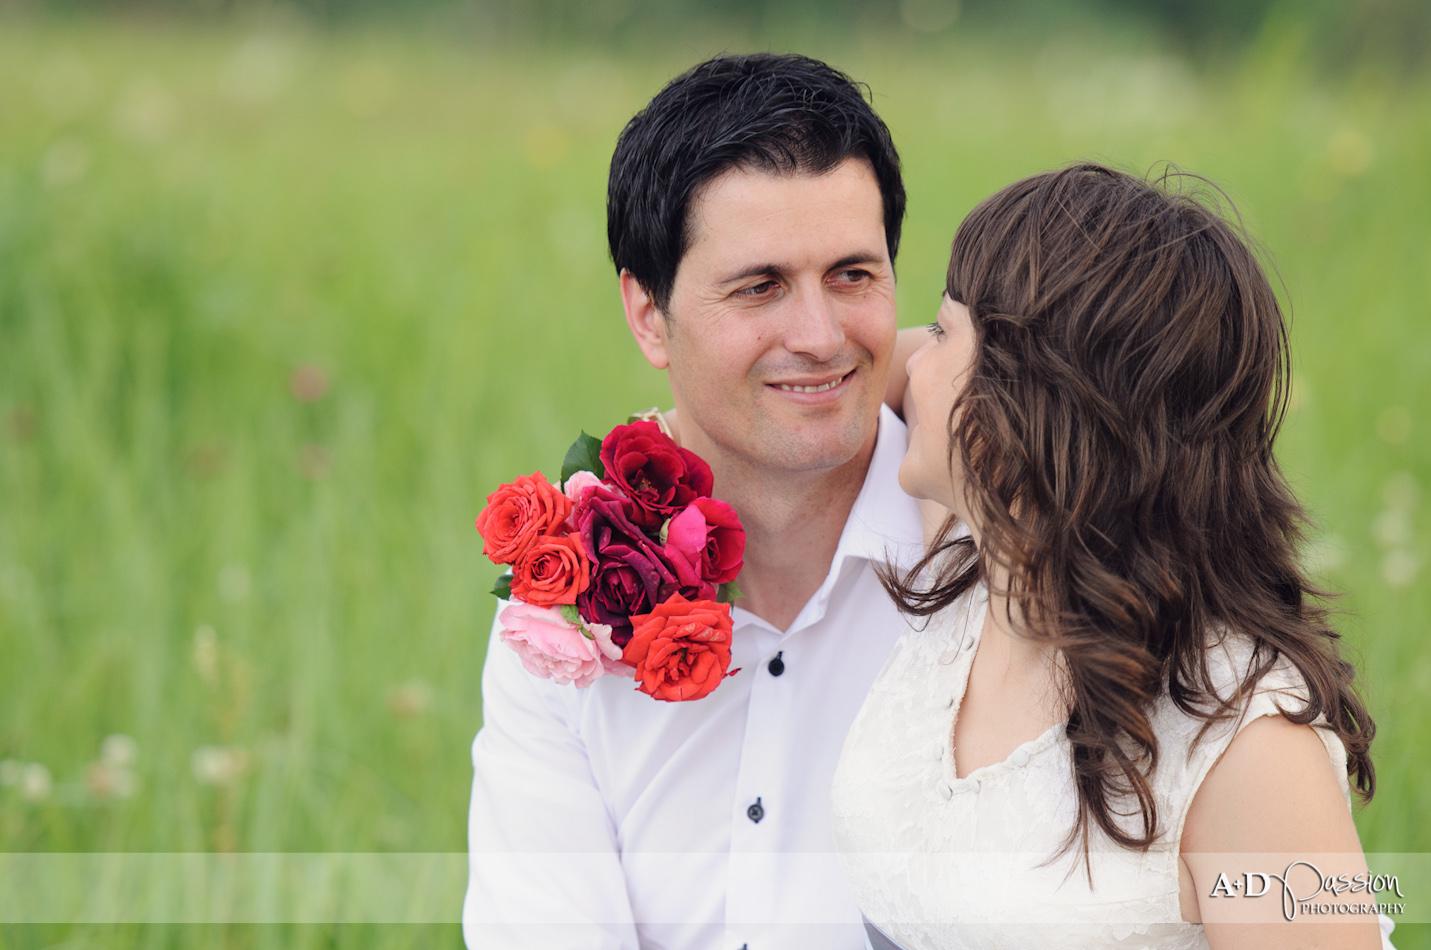 AD Passion Photography | 07042012_fotograf-profesionist-nunta_after-wedding_carmen-si-costi_0056 | Adelin, Dida, fotograf profesionist, fotograf de nunta, fotografie de nunta, fotograf Timisoara, fotograf Craiova, fotograf Bucuresti, fotograf Arad, nunta Timisoara, nunta Arad, nunta Bucuresti, nunta Craiova